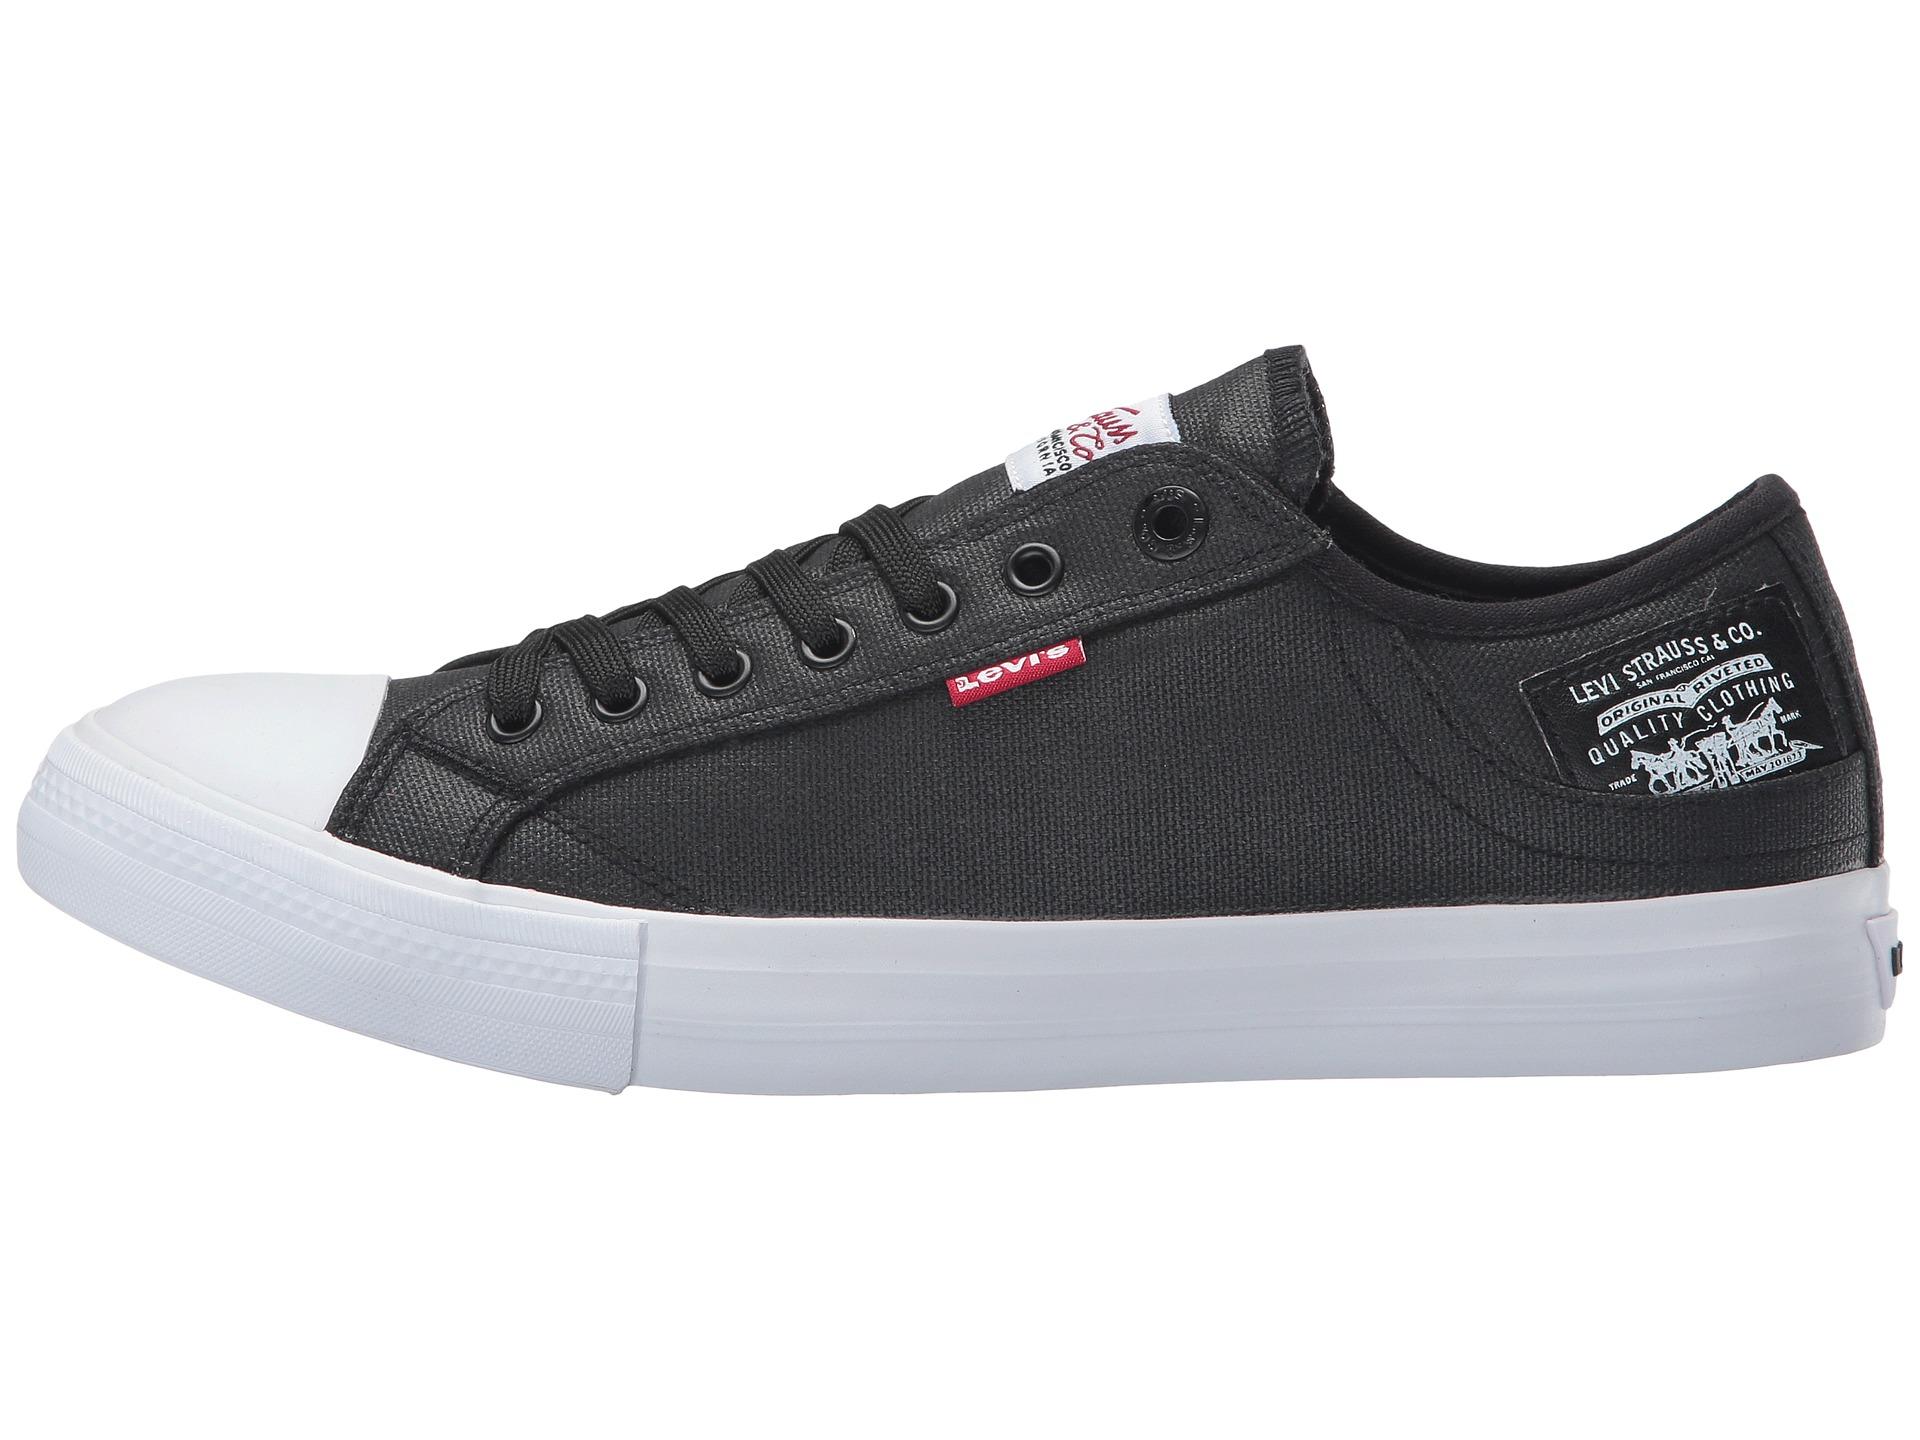 2c234e7eac3 ... australia chaussures jordan 6 femmes blanc noir rouge air jordan 30 air  0174f c22ef